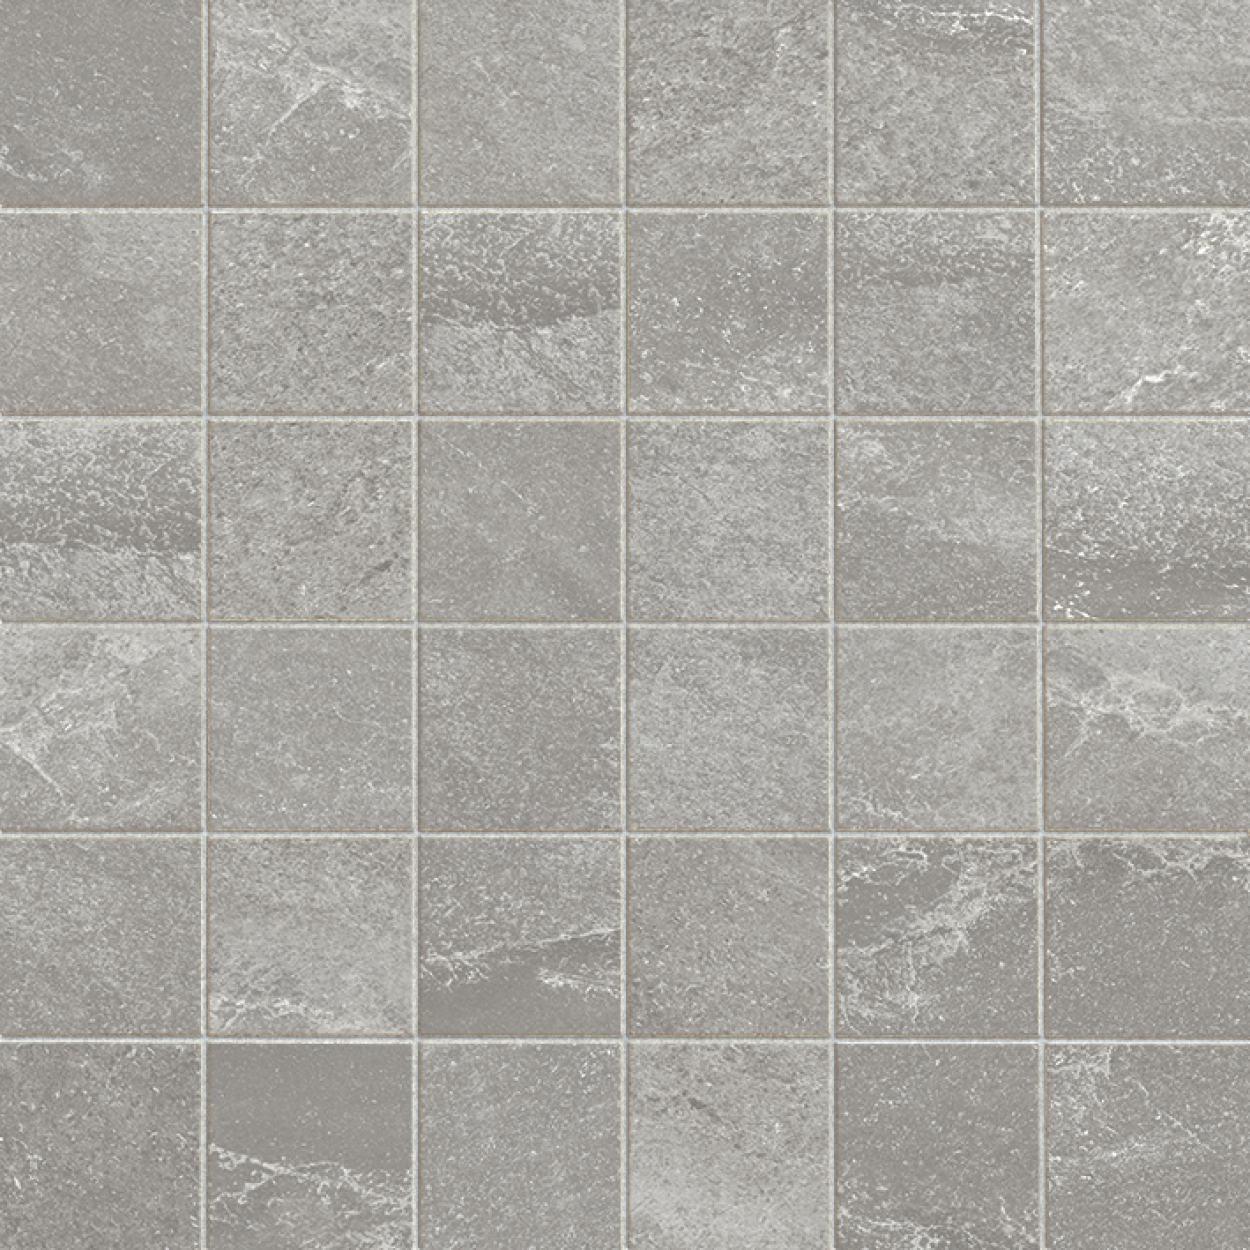 2 x 2 Board Dust mosaic